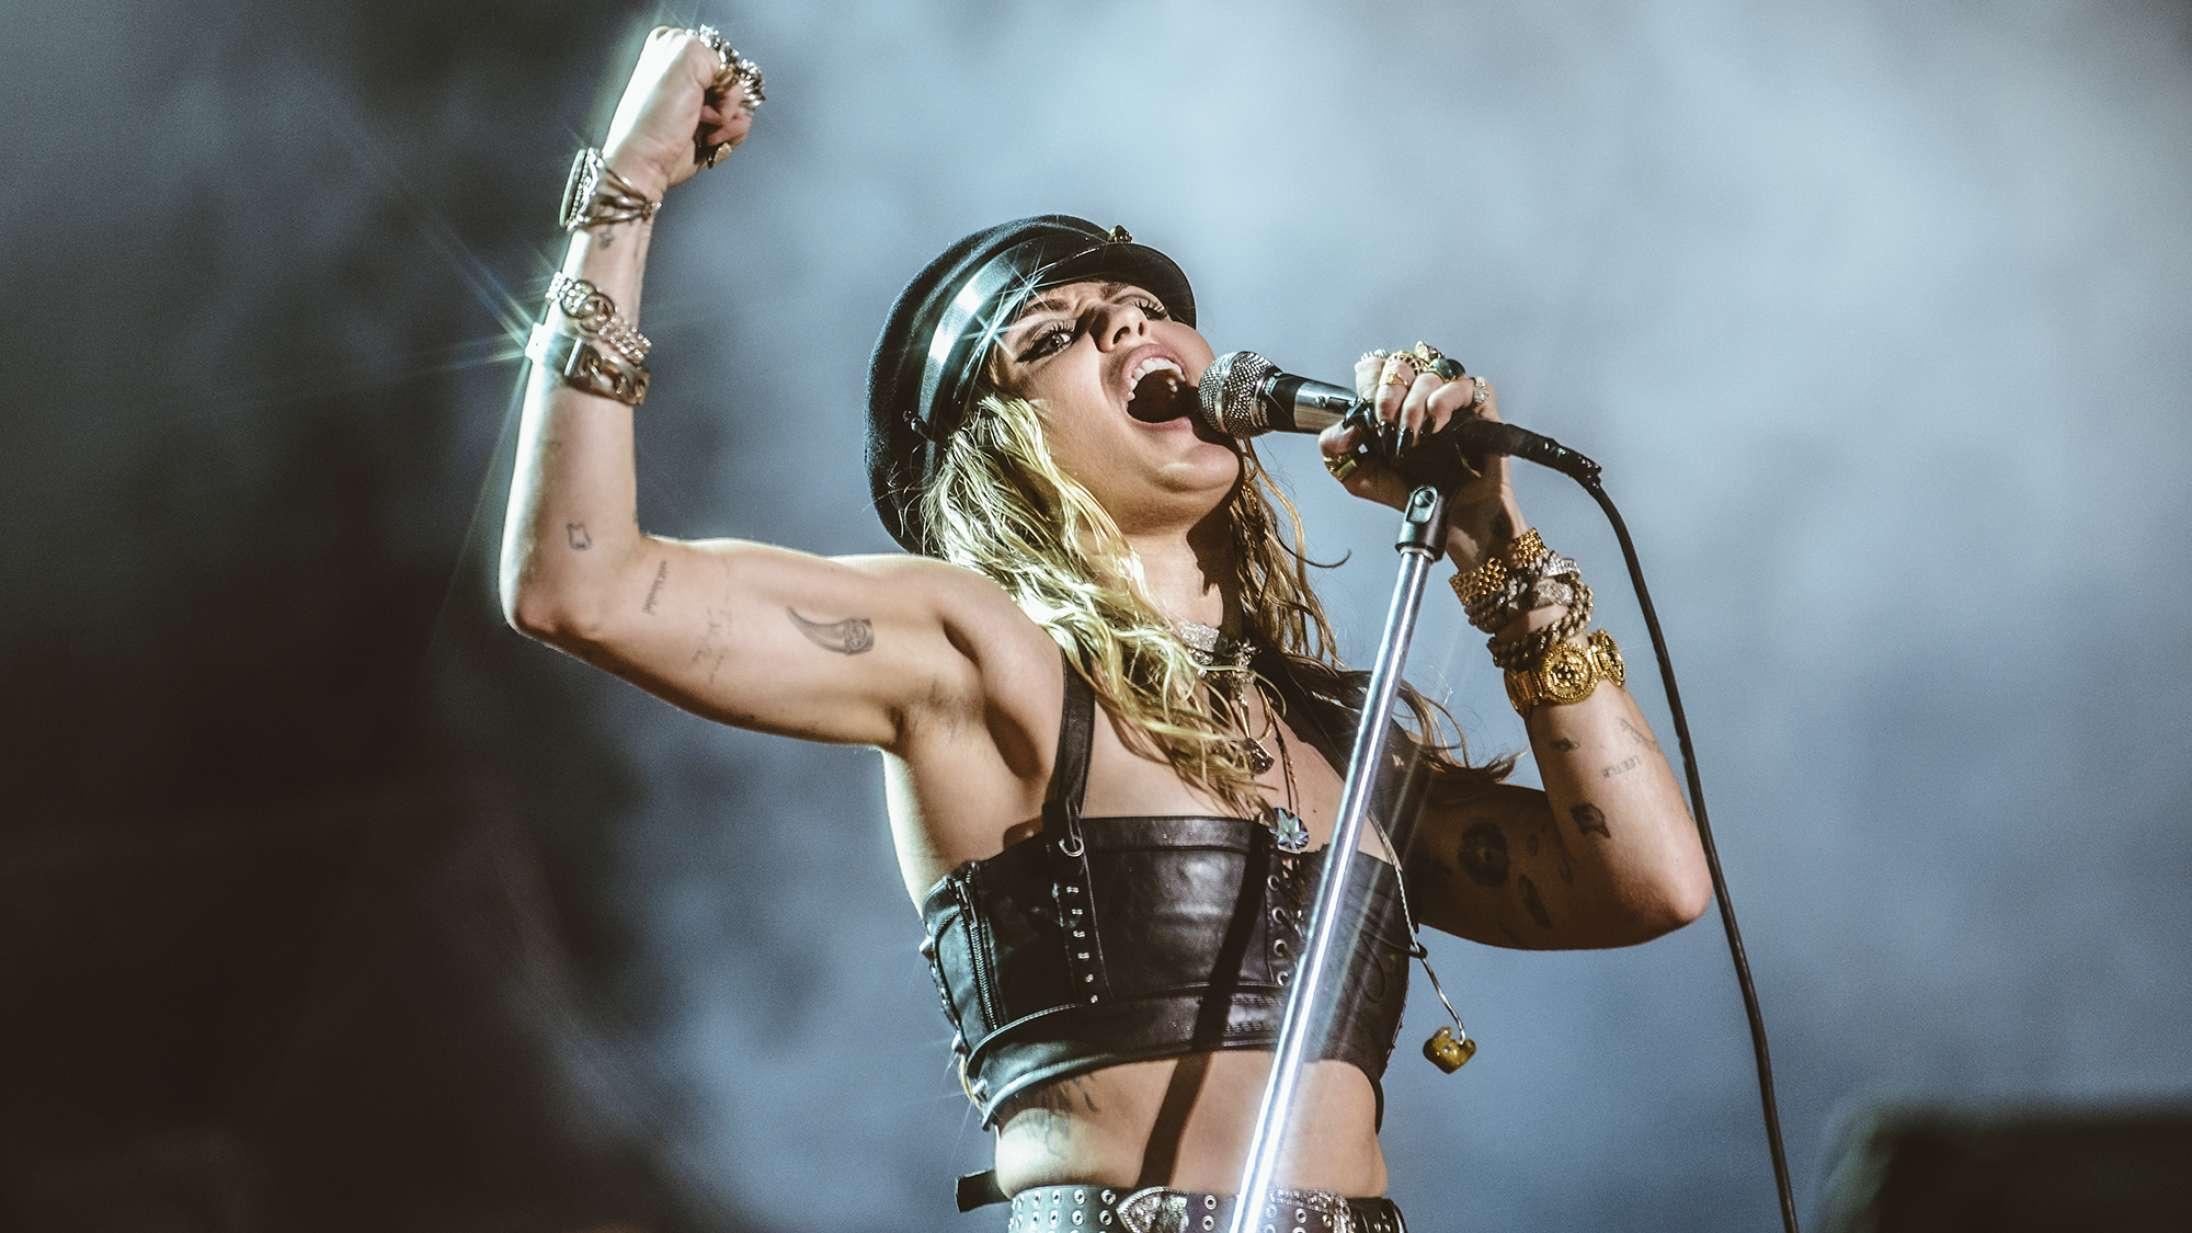 Miley Cyrus' nyeste projekt er et Metallica-coveralbum